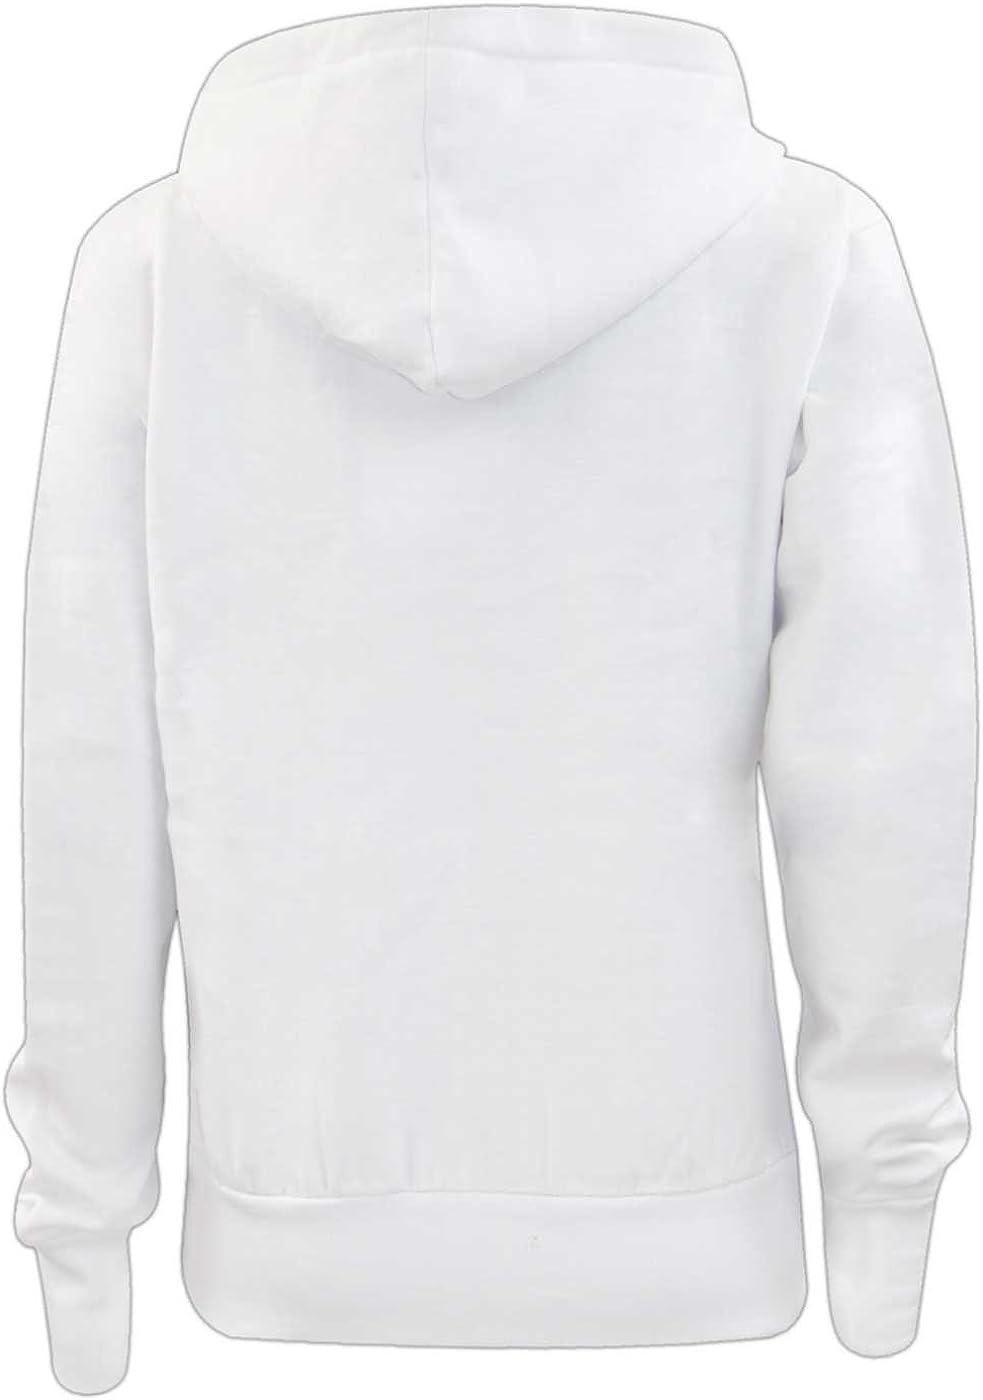 True Face Ladies Hoodie Zip Up Plain Womens Sweatshirt Fleece Full Zipper Hooded Long Sleeve Zipped Top White